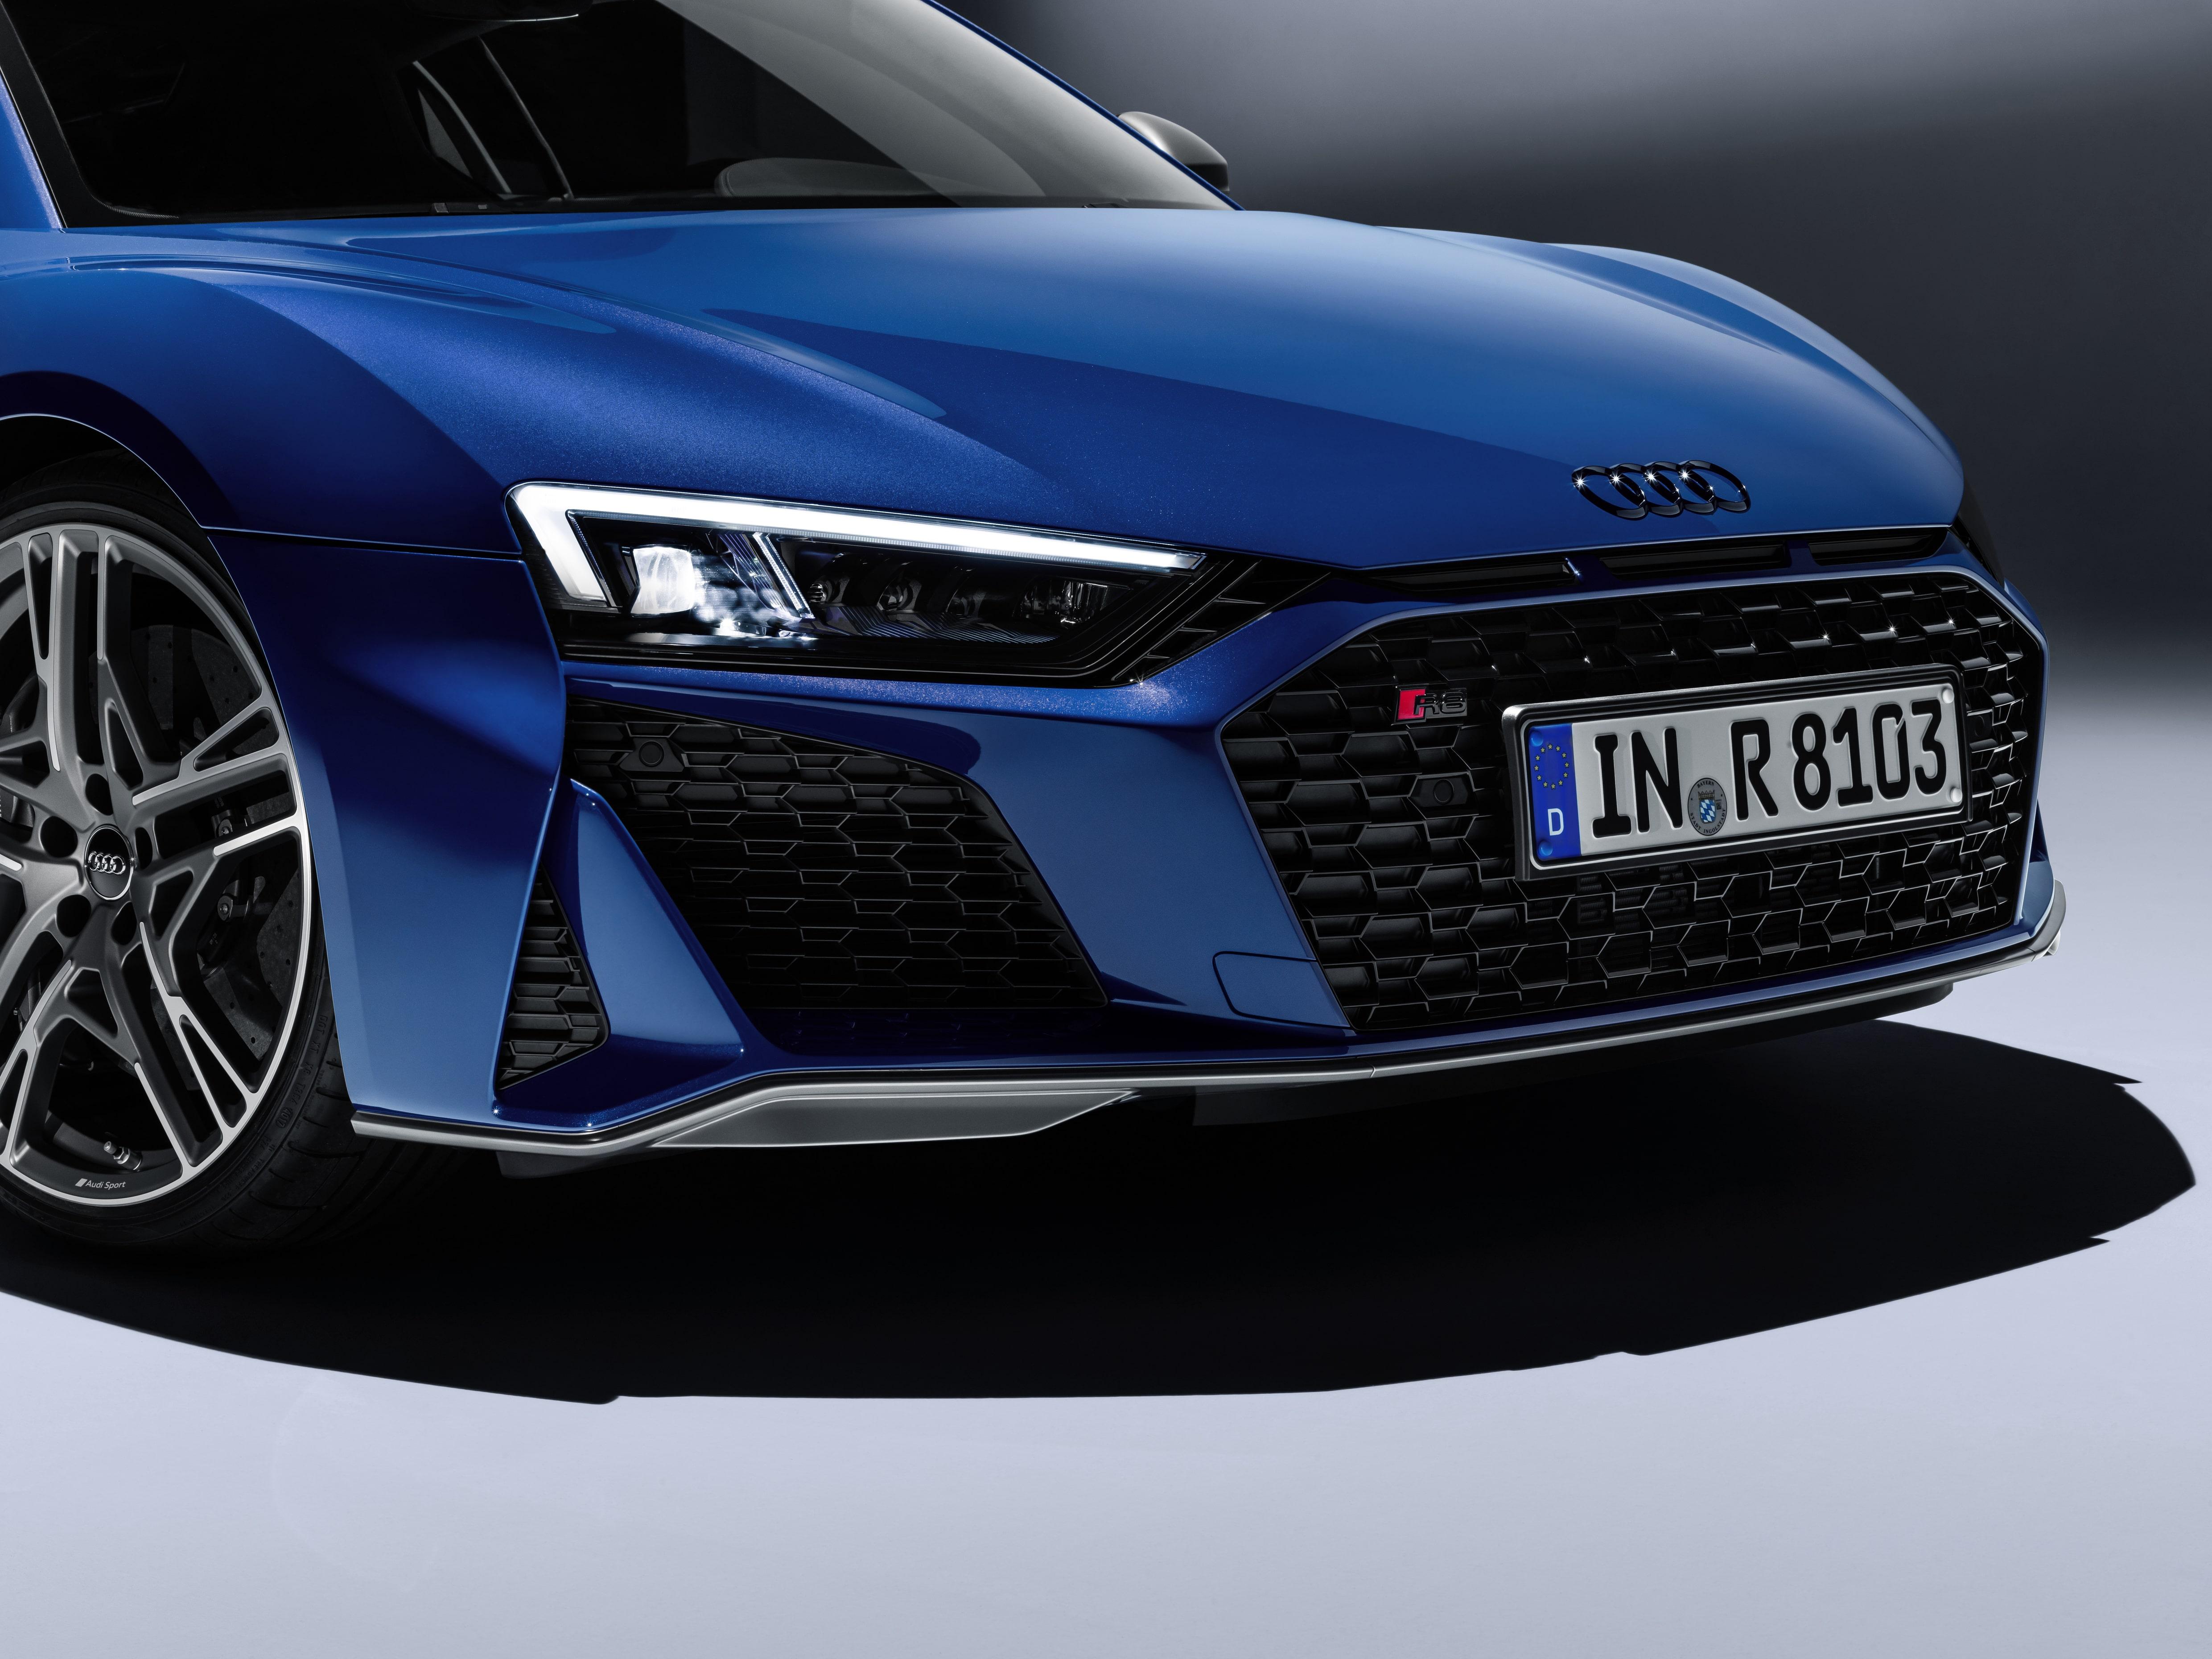 audi r8 audi r8 Audi R8 2019: design aggressivo e performance superiori a1812851 large